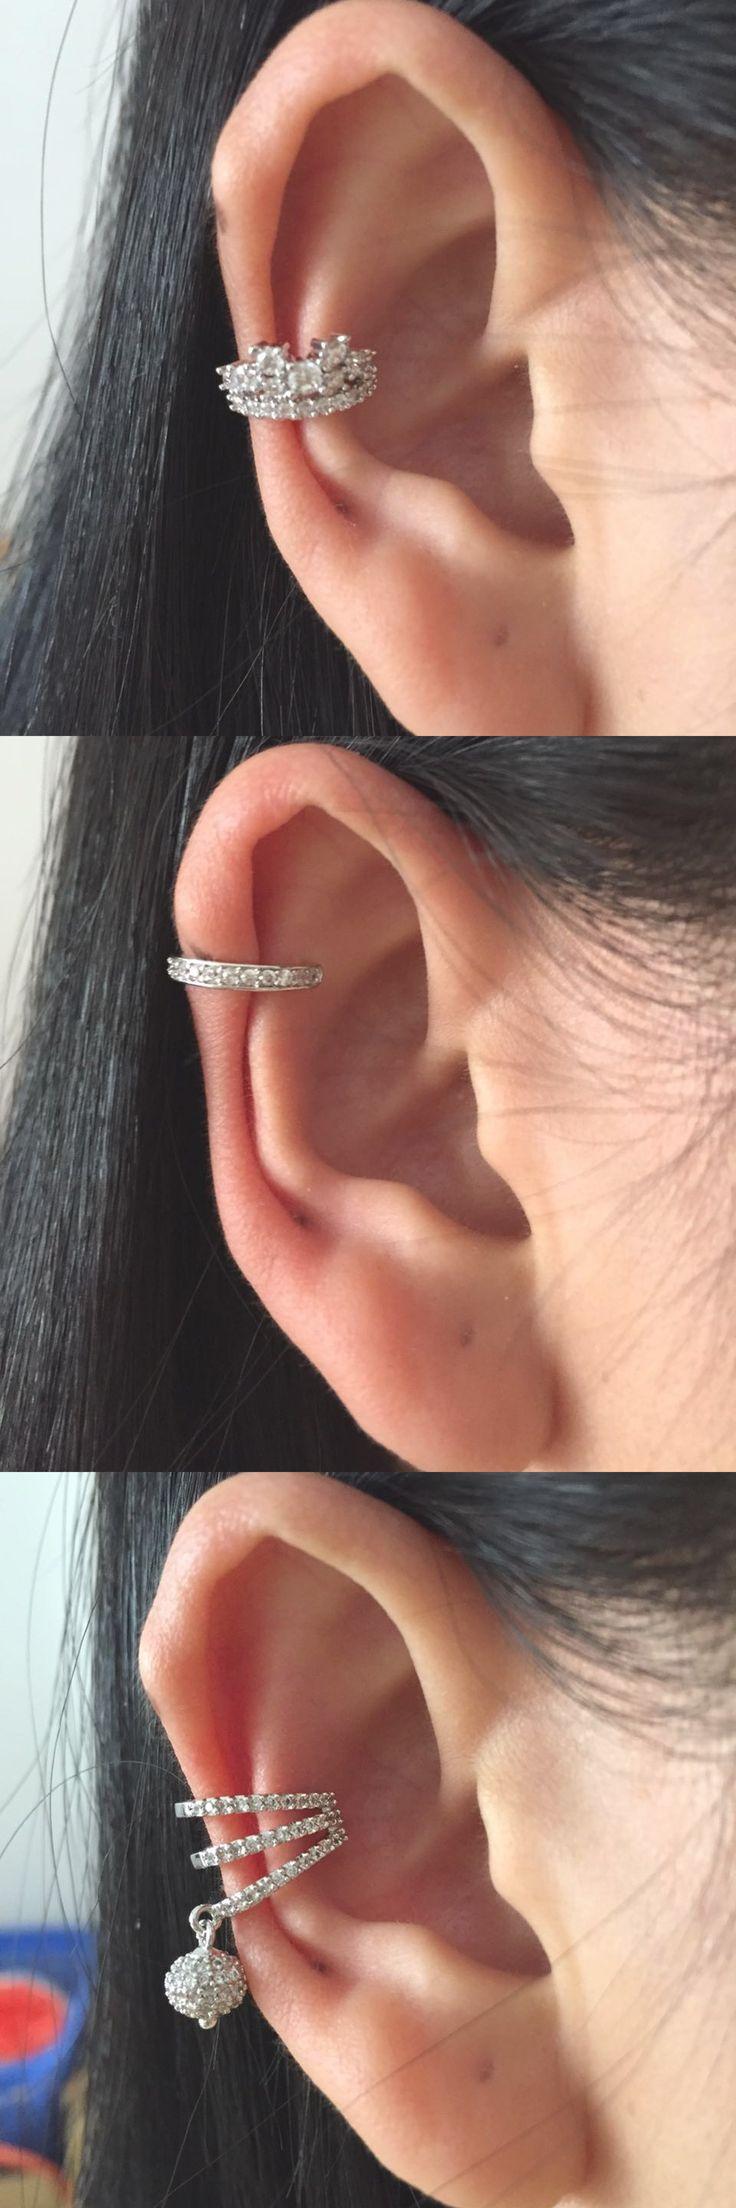 Classy Ear Piercing Ideas for Women at MyBodiArt.com - Upper Ear Cartilage Earring - Conch Ring - Fake Piercing Ear Cuff for Helix Hoop Silver Crystals